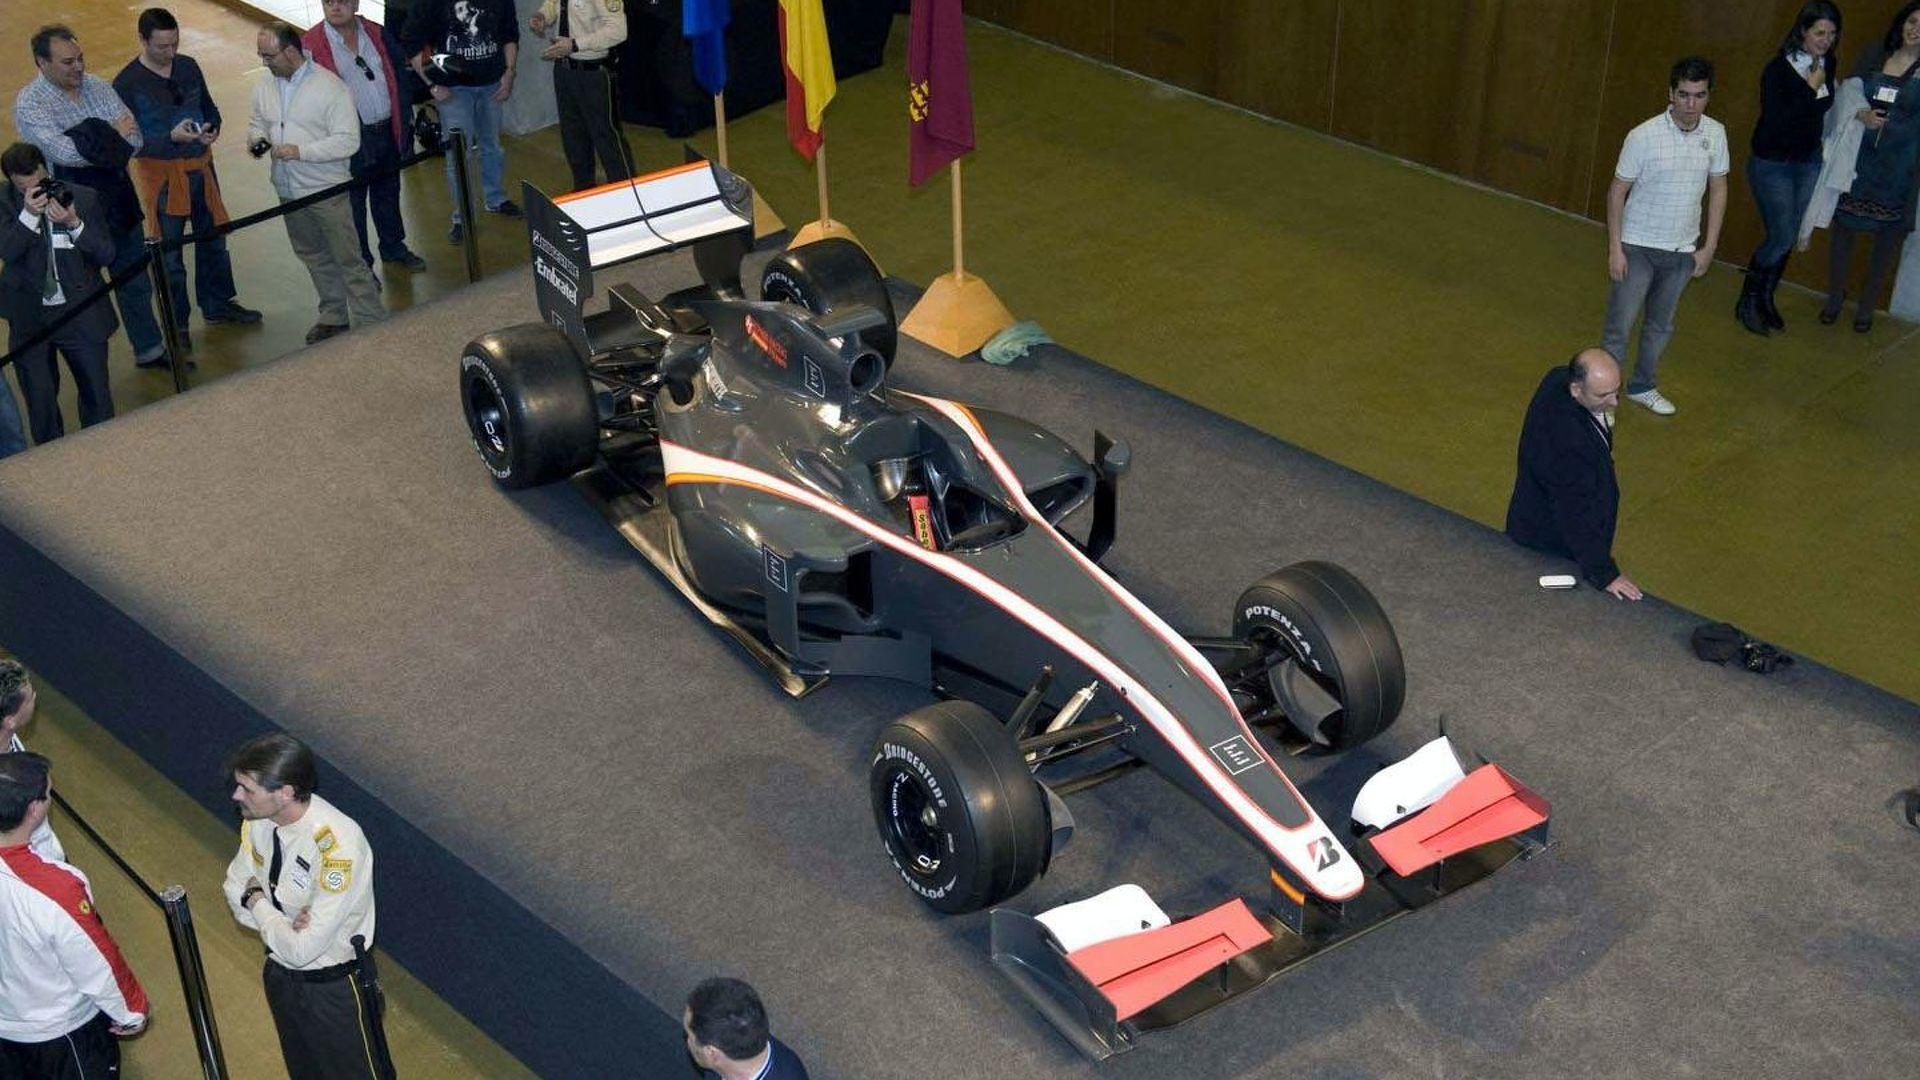 HRT should be quicker than Virgin and Lotus - Senna